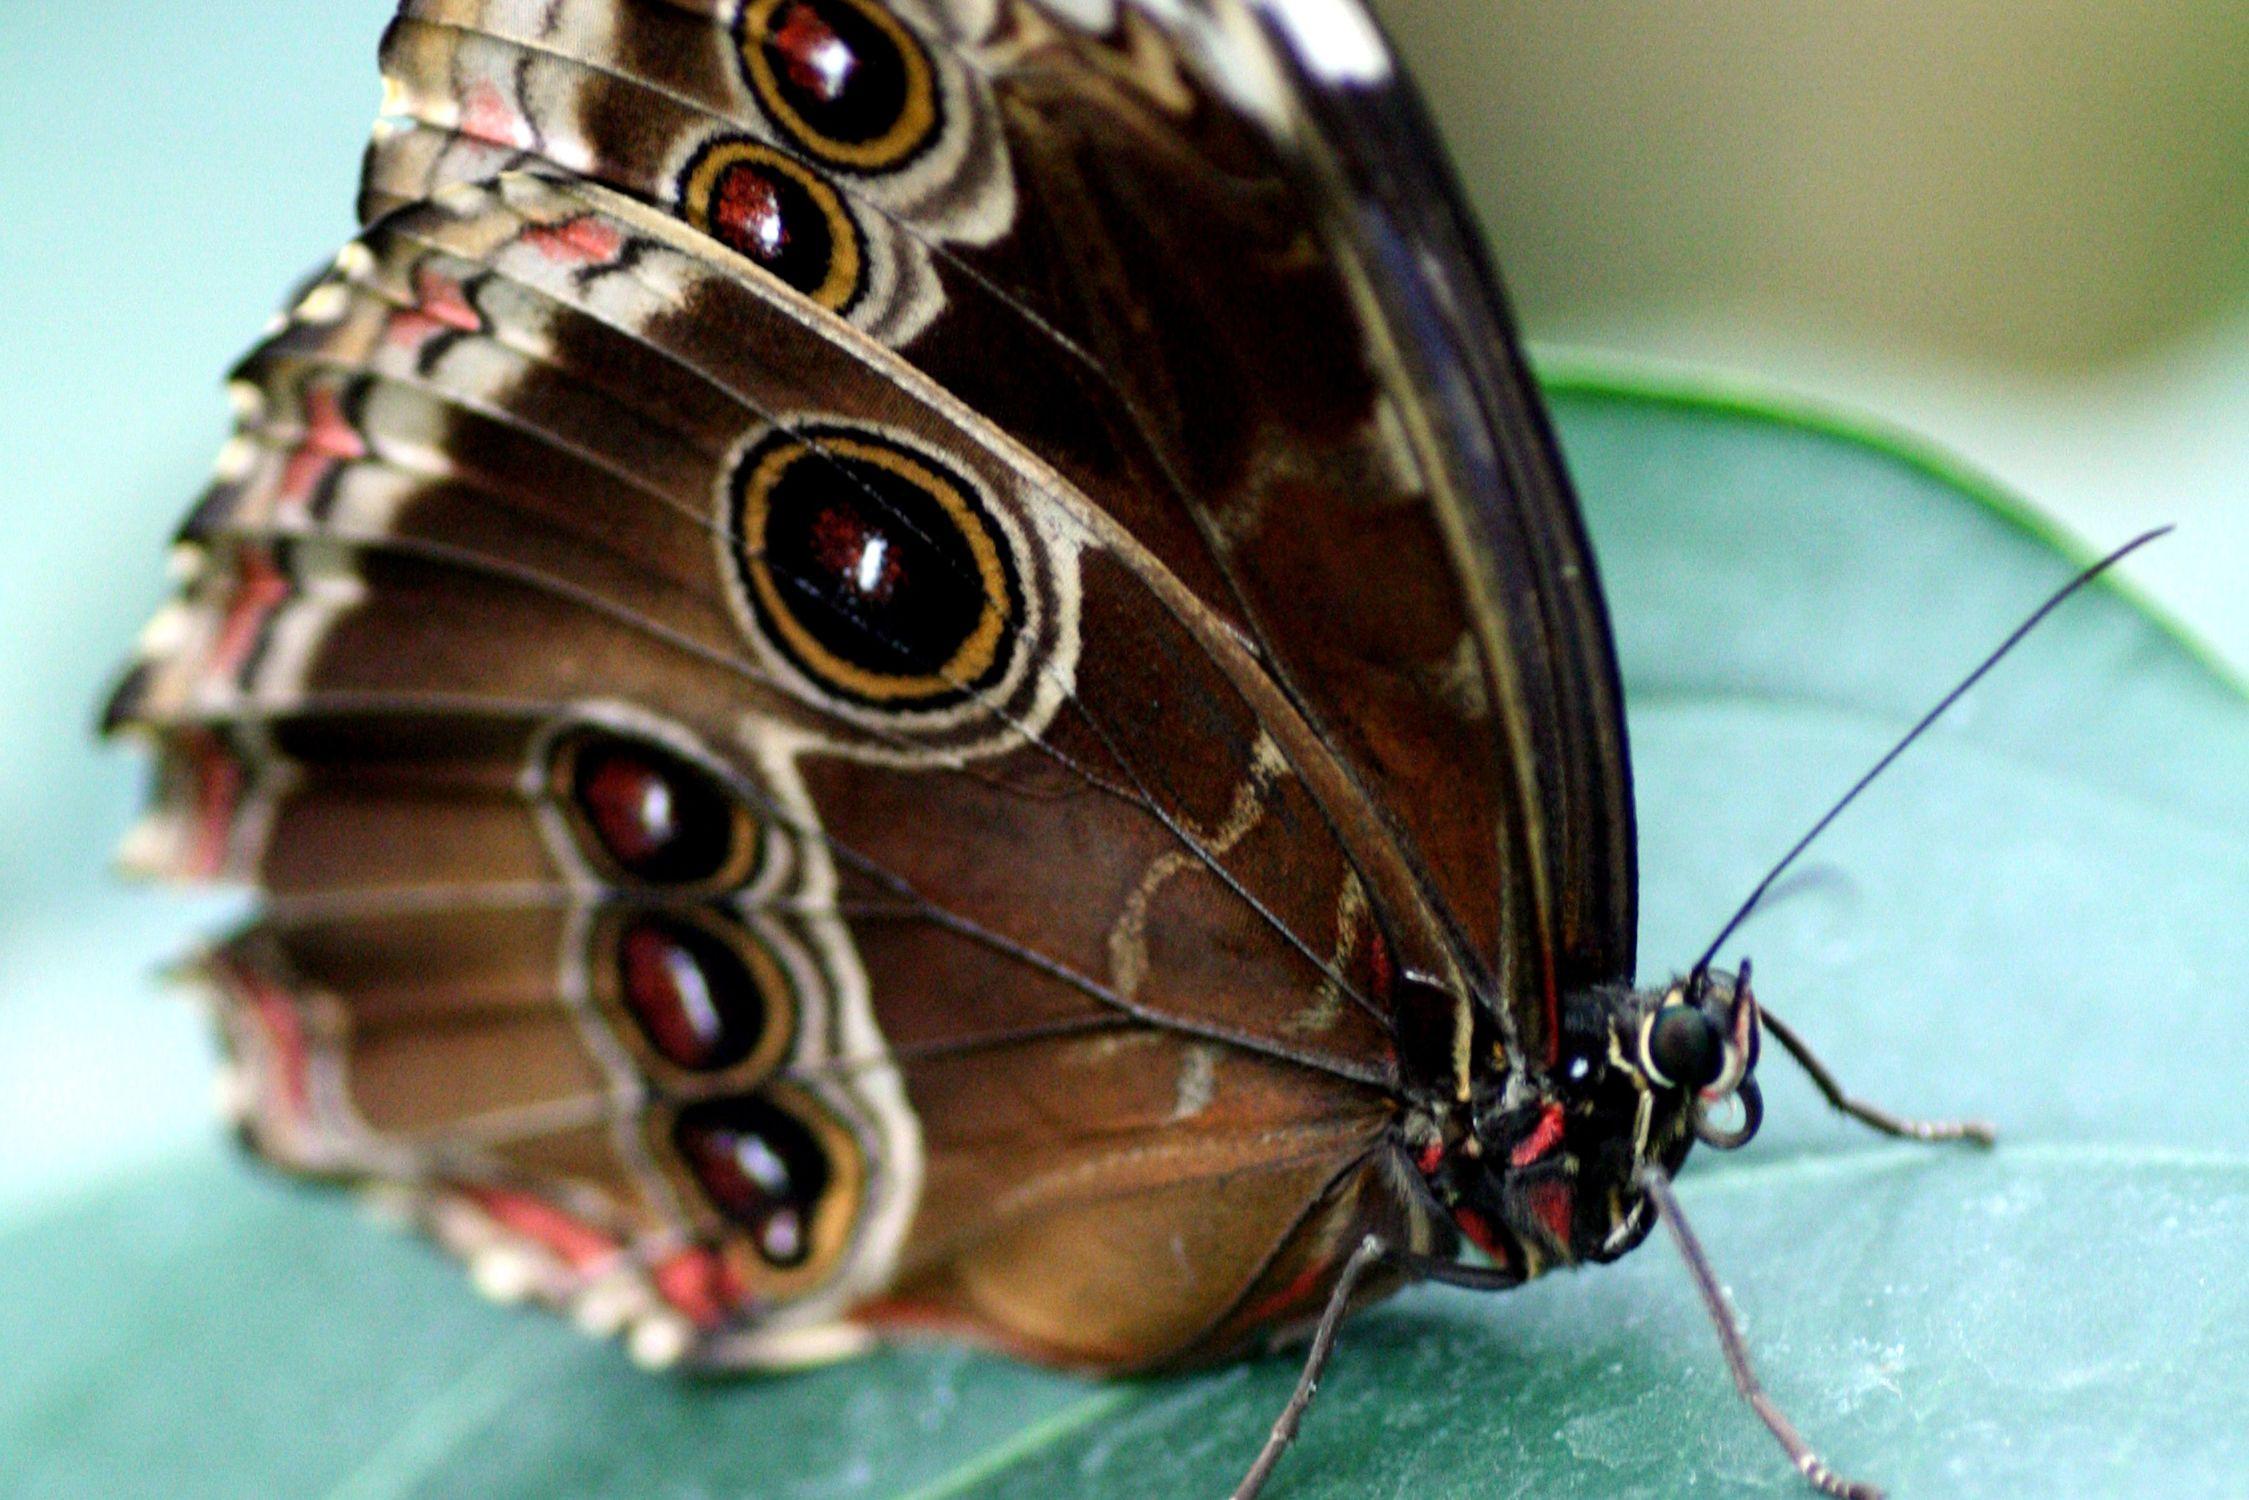 Bild mit Tiere, Insekten, Schmetterlinge, Schmetterling, Insekt